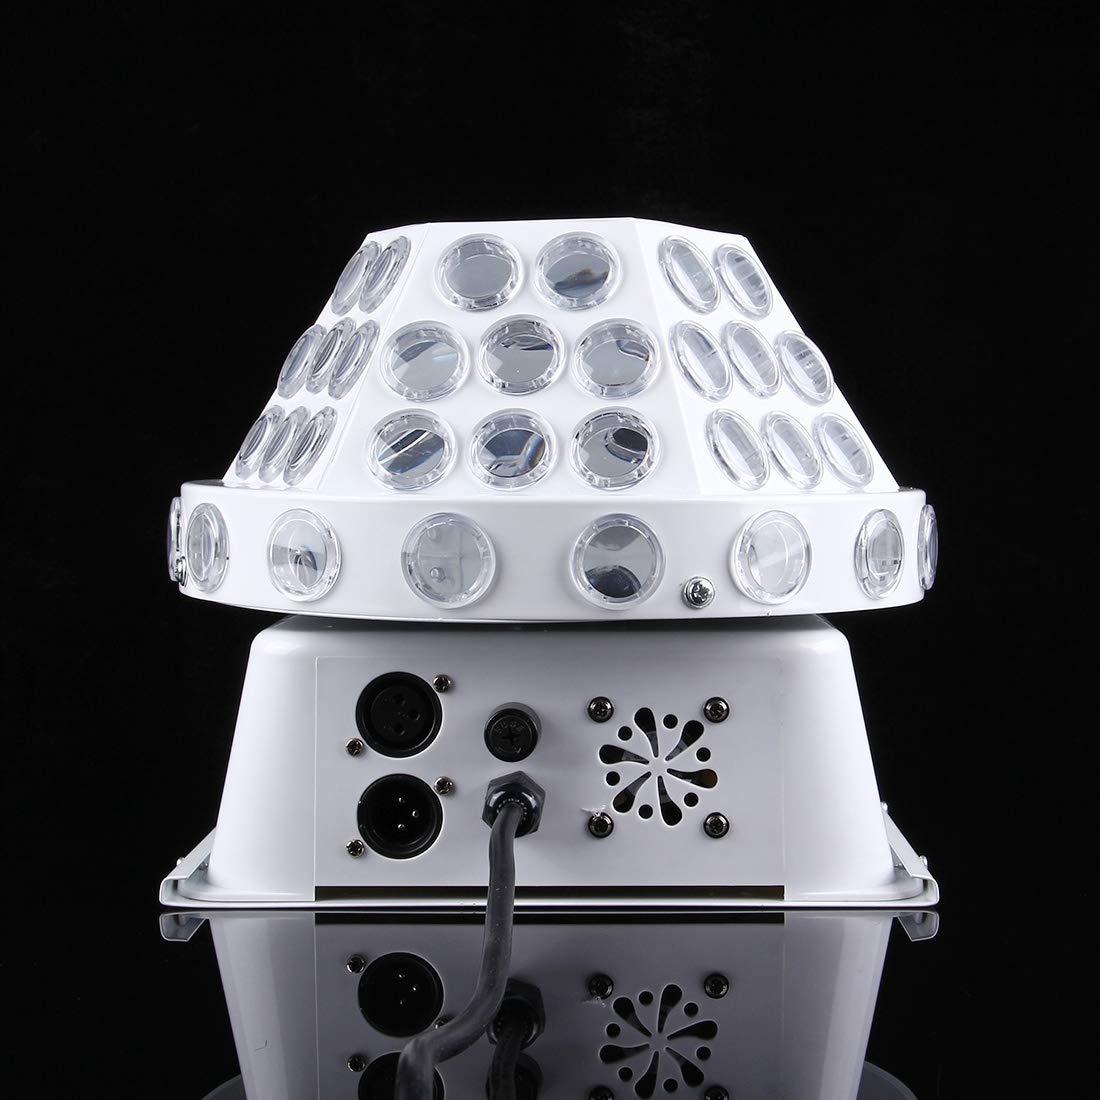 stage lighting 30W Mushroom Magic Ball LED Crystal Light, Master/Slave / DMX512 / Auto Run/Sound Control Modes, AC 220V by stage lighting (Image #3)